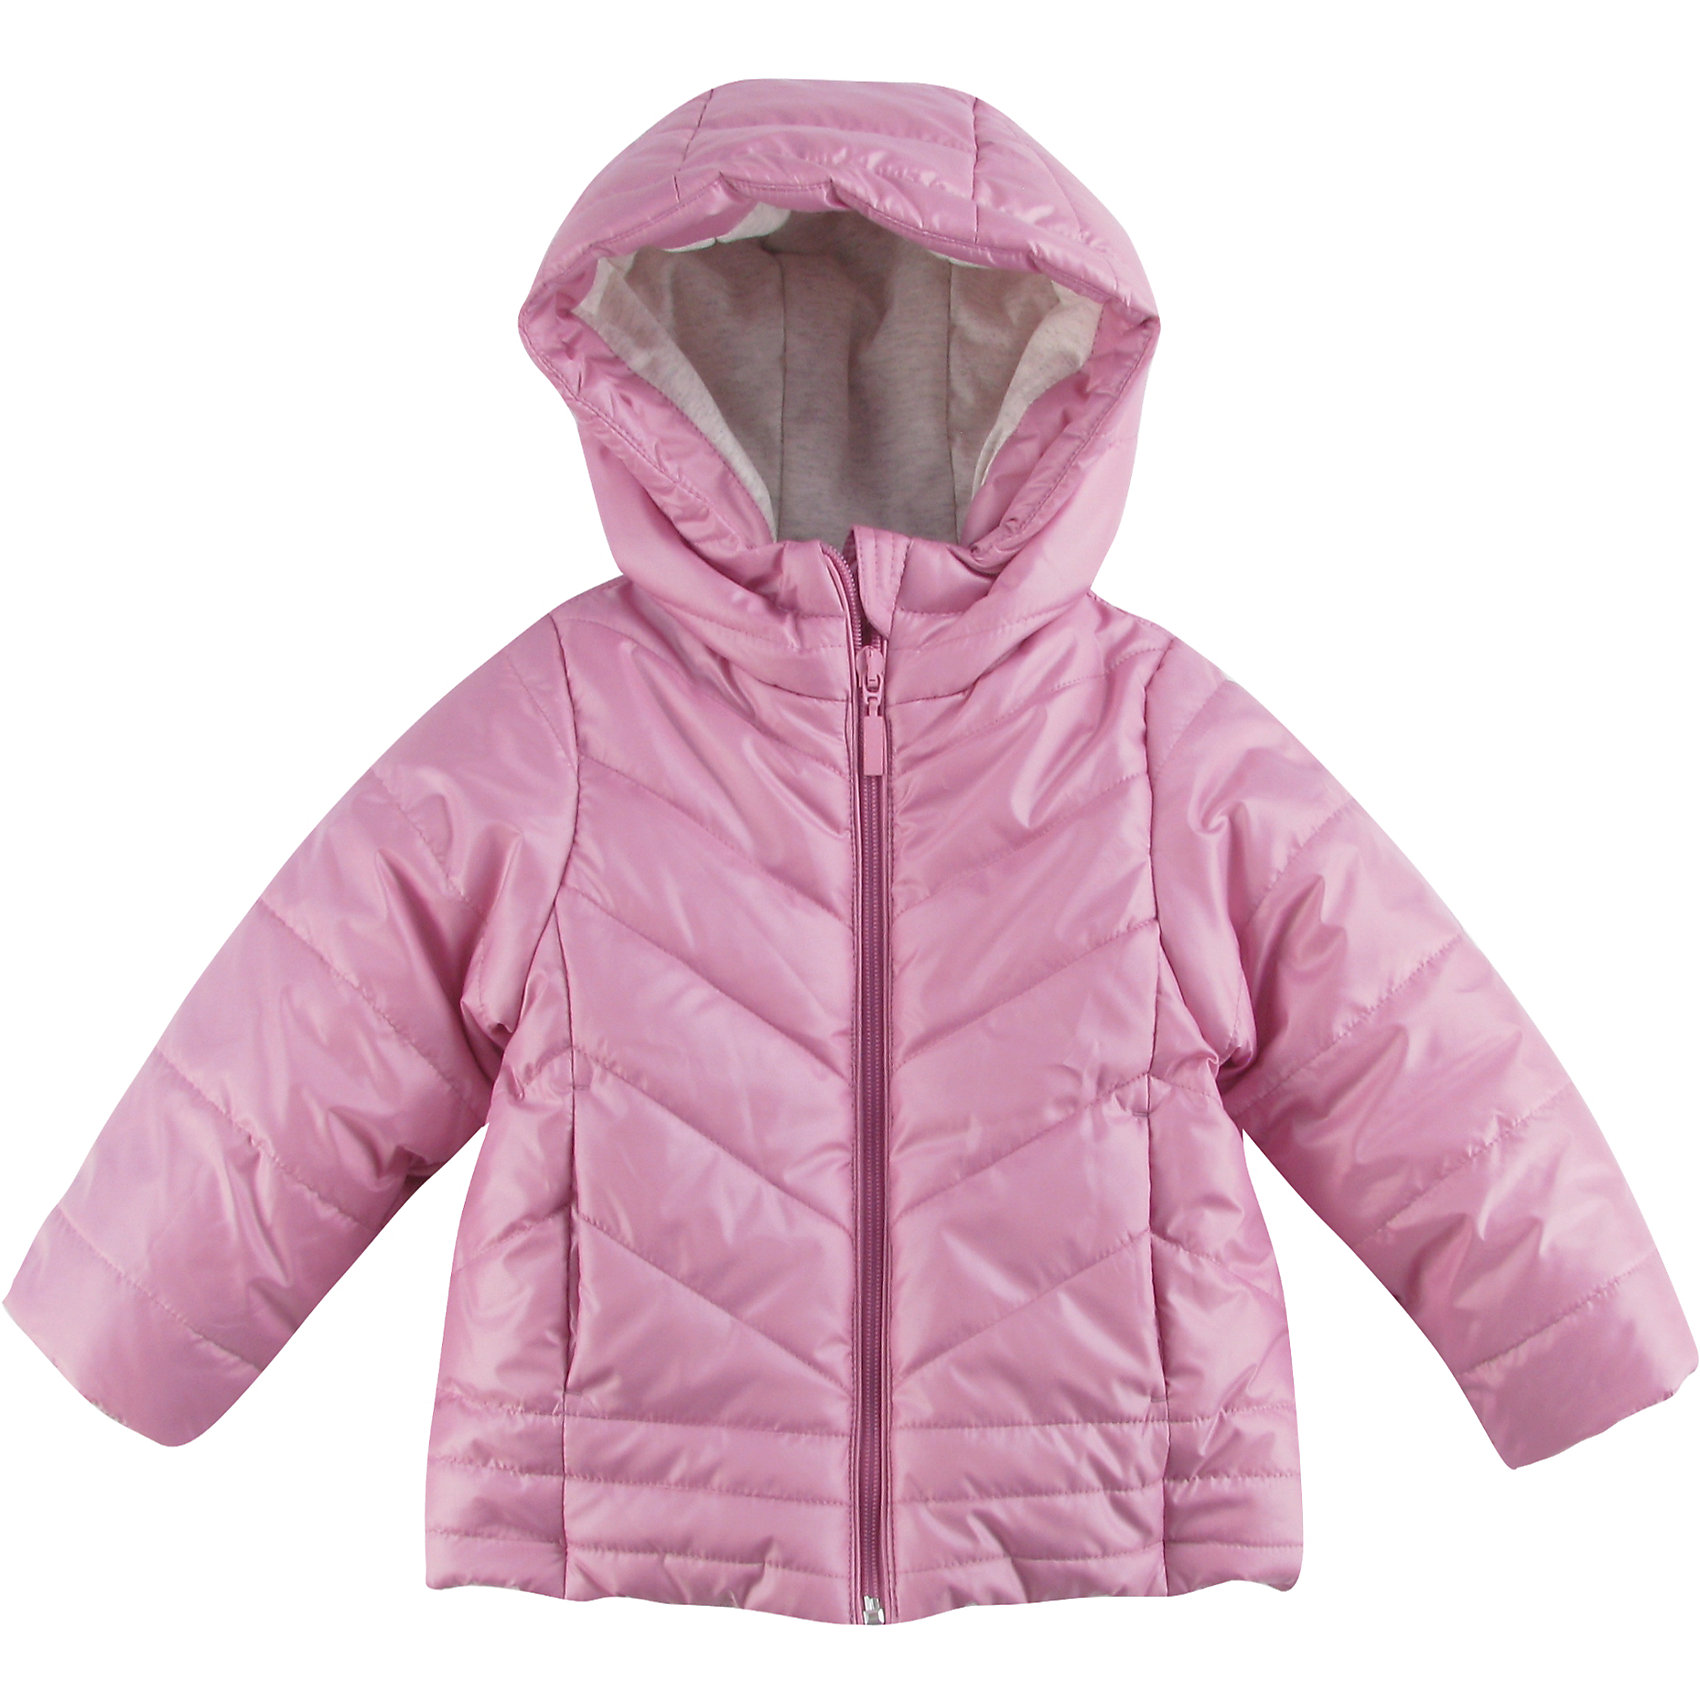 Куртка утепленная для девочки WojcikВерхняя одежда<br>Куртка утепленная для девочки Wojcik<br>Состав:<br>Полиэстер 100%<br><br>Ширина мм: 356<br>Глубина мм: 10<br>Высота мм: 245<br>Вес г: 519<br>Цвет: розовый<br>Возраст от месяцев: 96<br>Возраст до месяцев: 108<br>Пол: Женский<br>Возраст: Детский<br>Размер: 134,92,98,104,110,116,122,128<br>SKU: 5591330